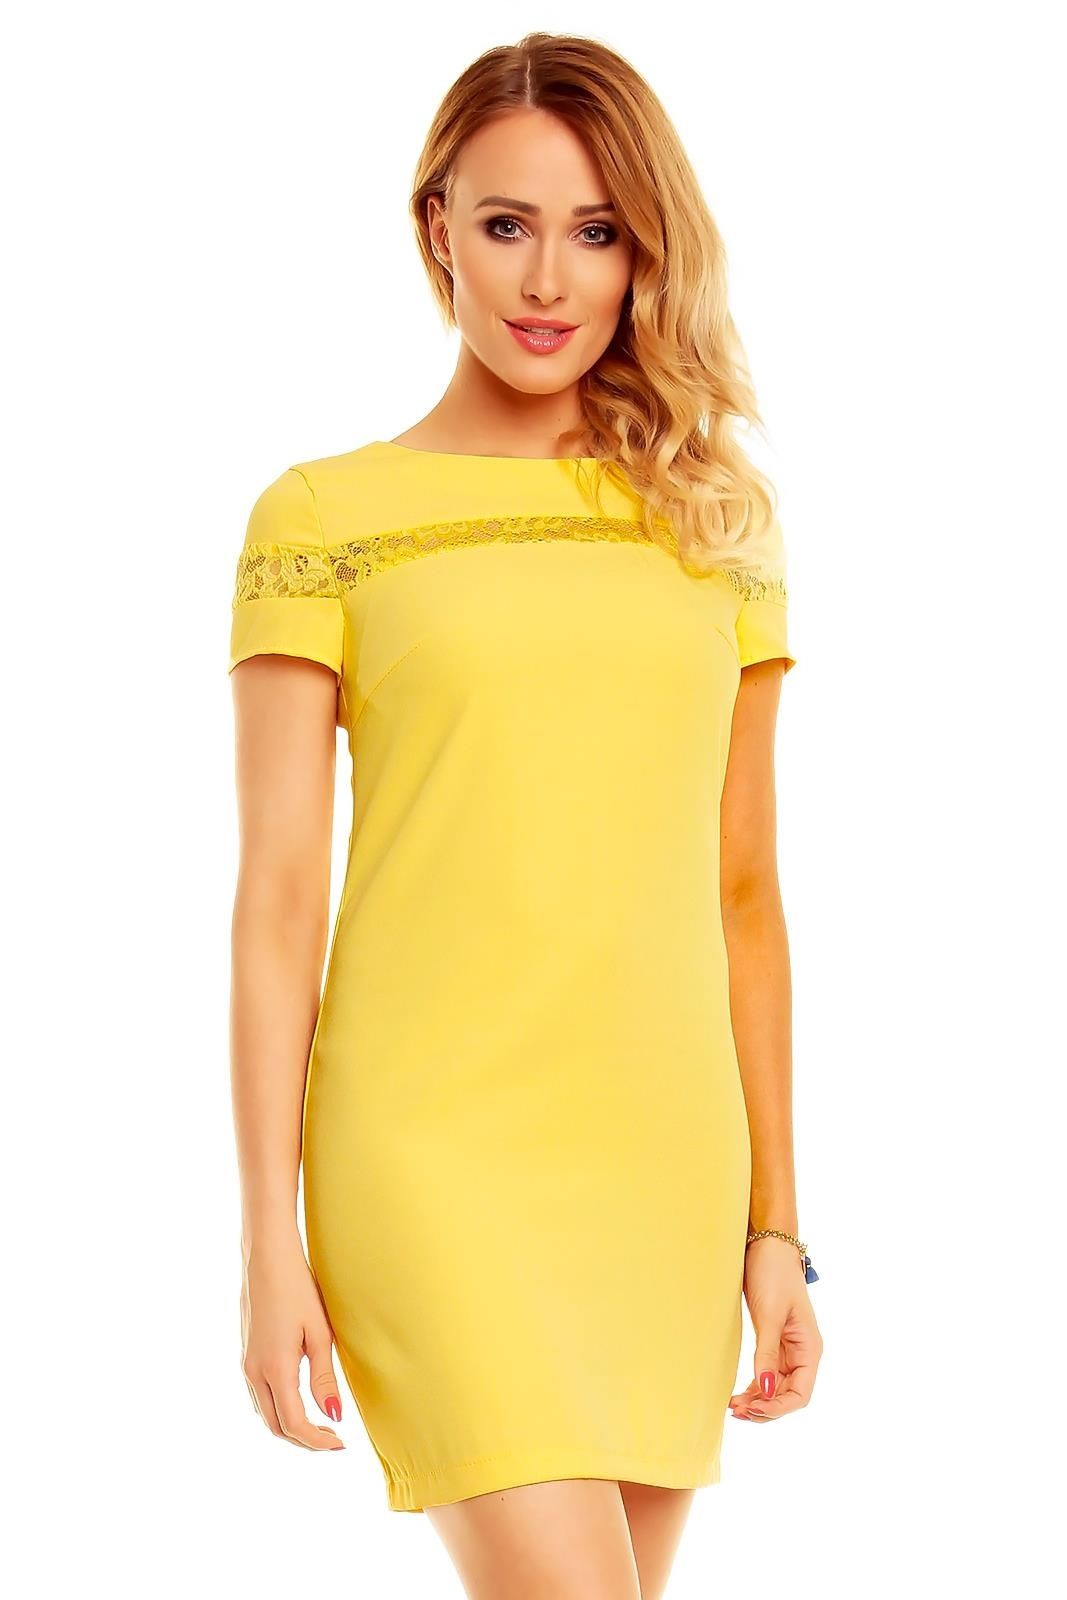 c0b117b38df Robe courte pas cher robe tendance fashion robe jaune TM-10124 - Toufamode